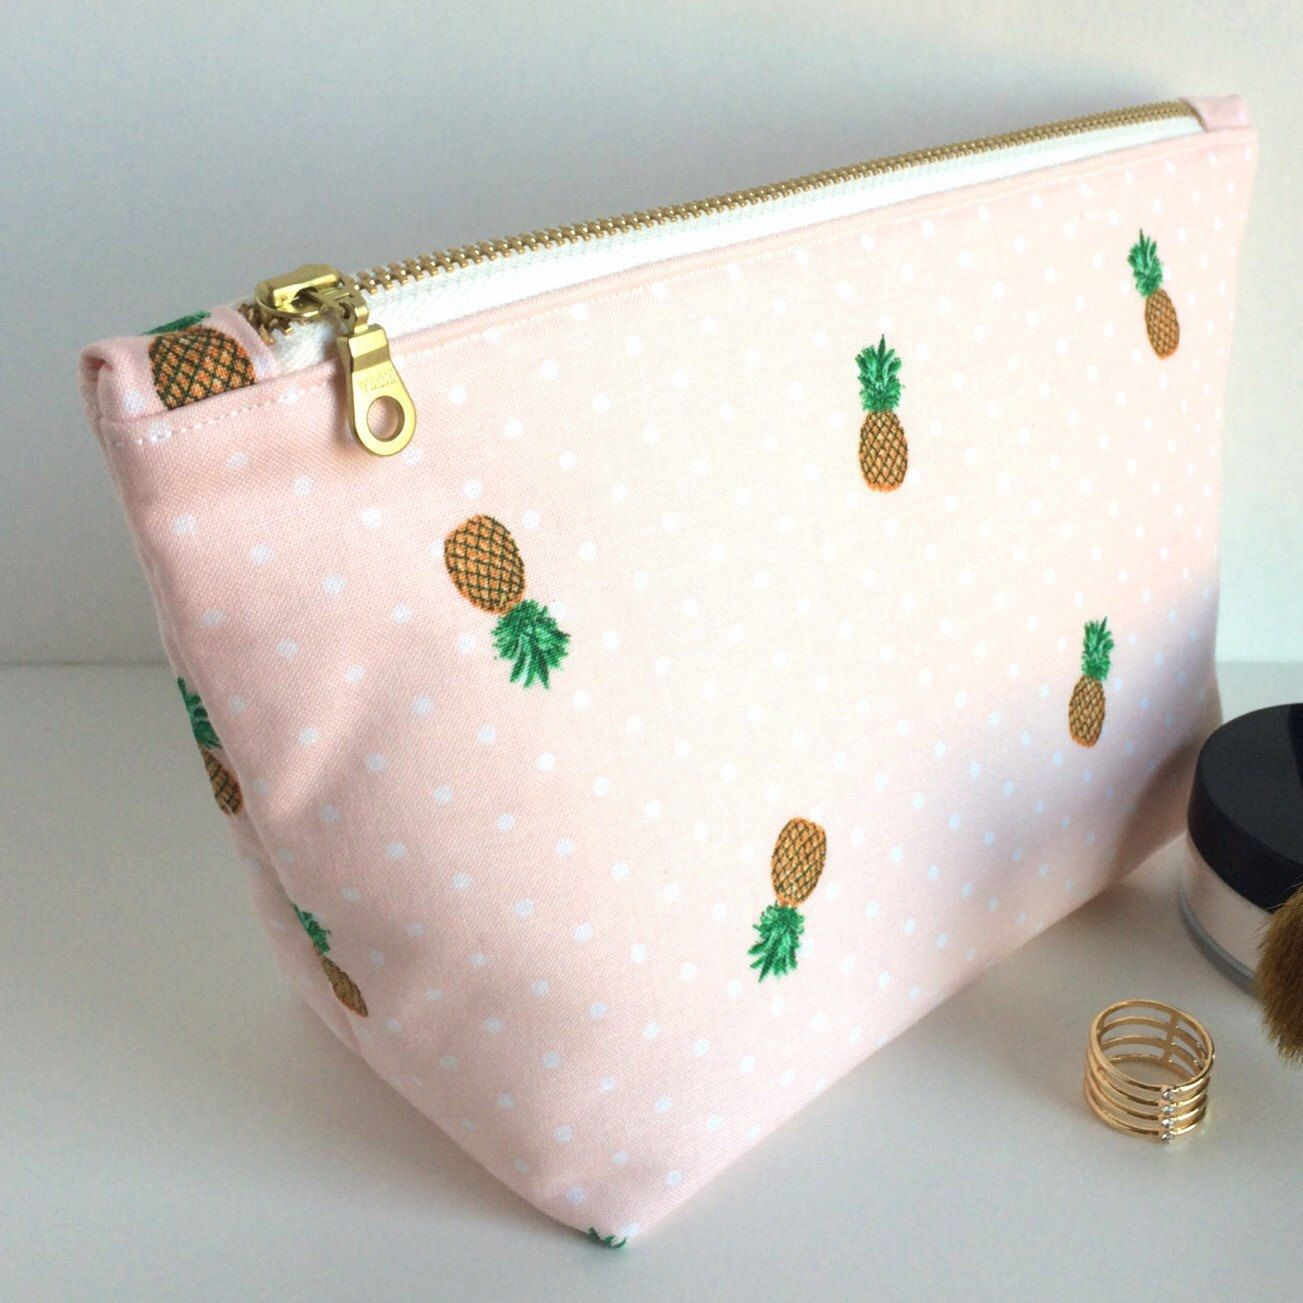 Pink  Pineapple Makeup Bag!! The perfect Summer Bag!! Fun Gift Idea ... 7839bcb4f7ab1